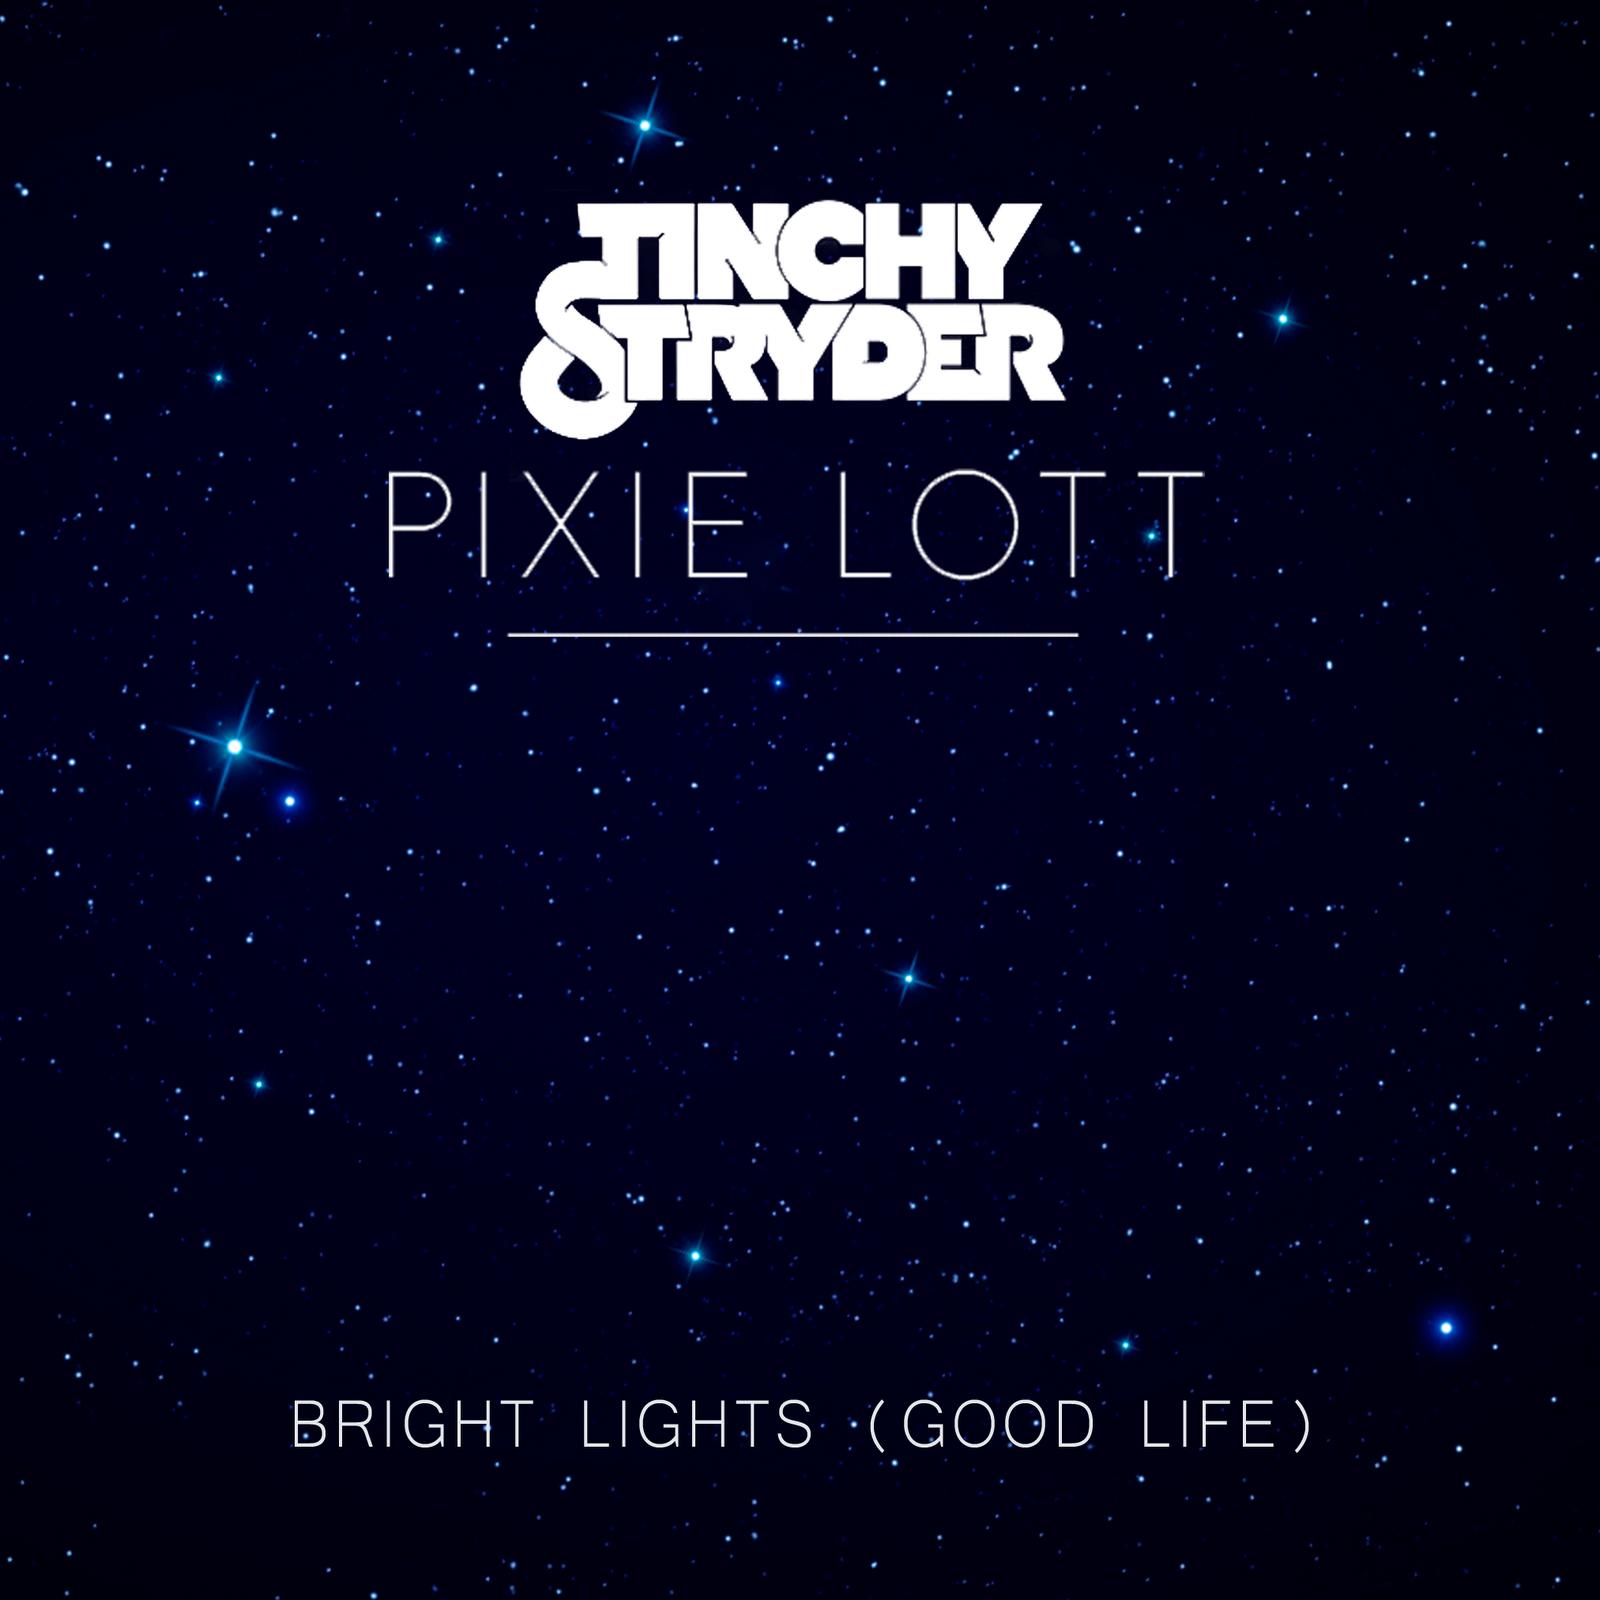 http://3.bp.blogspot.com/-kWw40qbqn1c/TwYmDc6zayI/AAAAAAAAAok/CTRiizxrIXQ/s1600/Tinchy+Stryder+Pixie+Lott+Bright+Lights+%2528Good+Life%2529.png